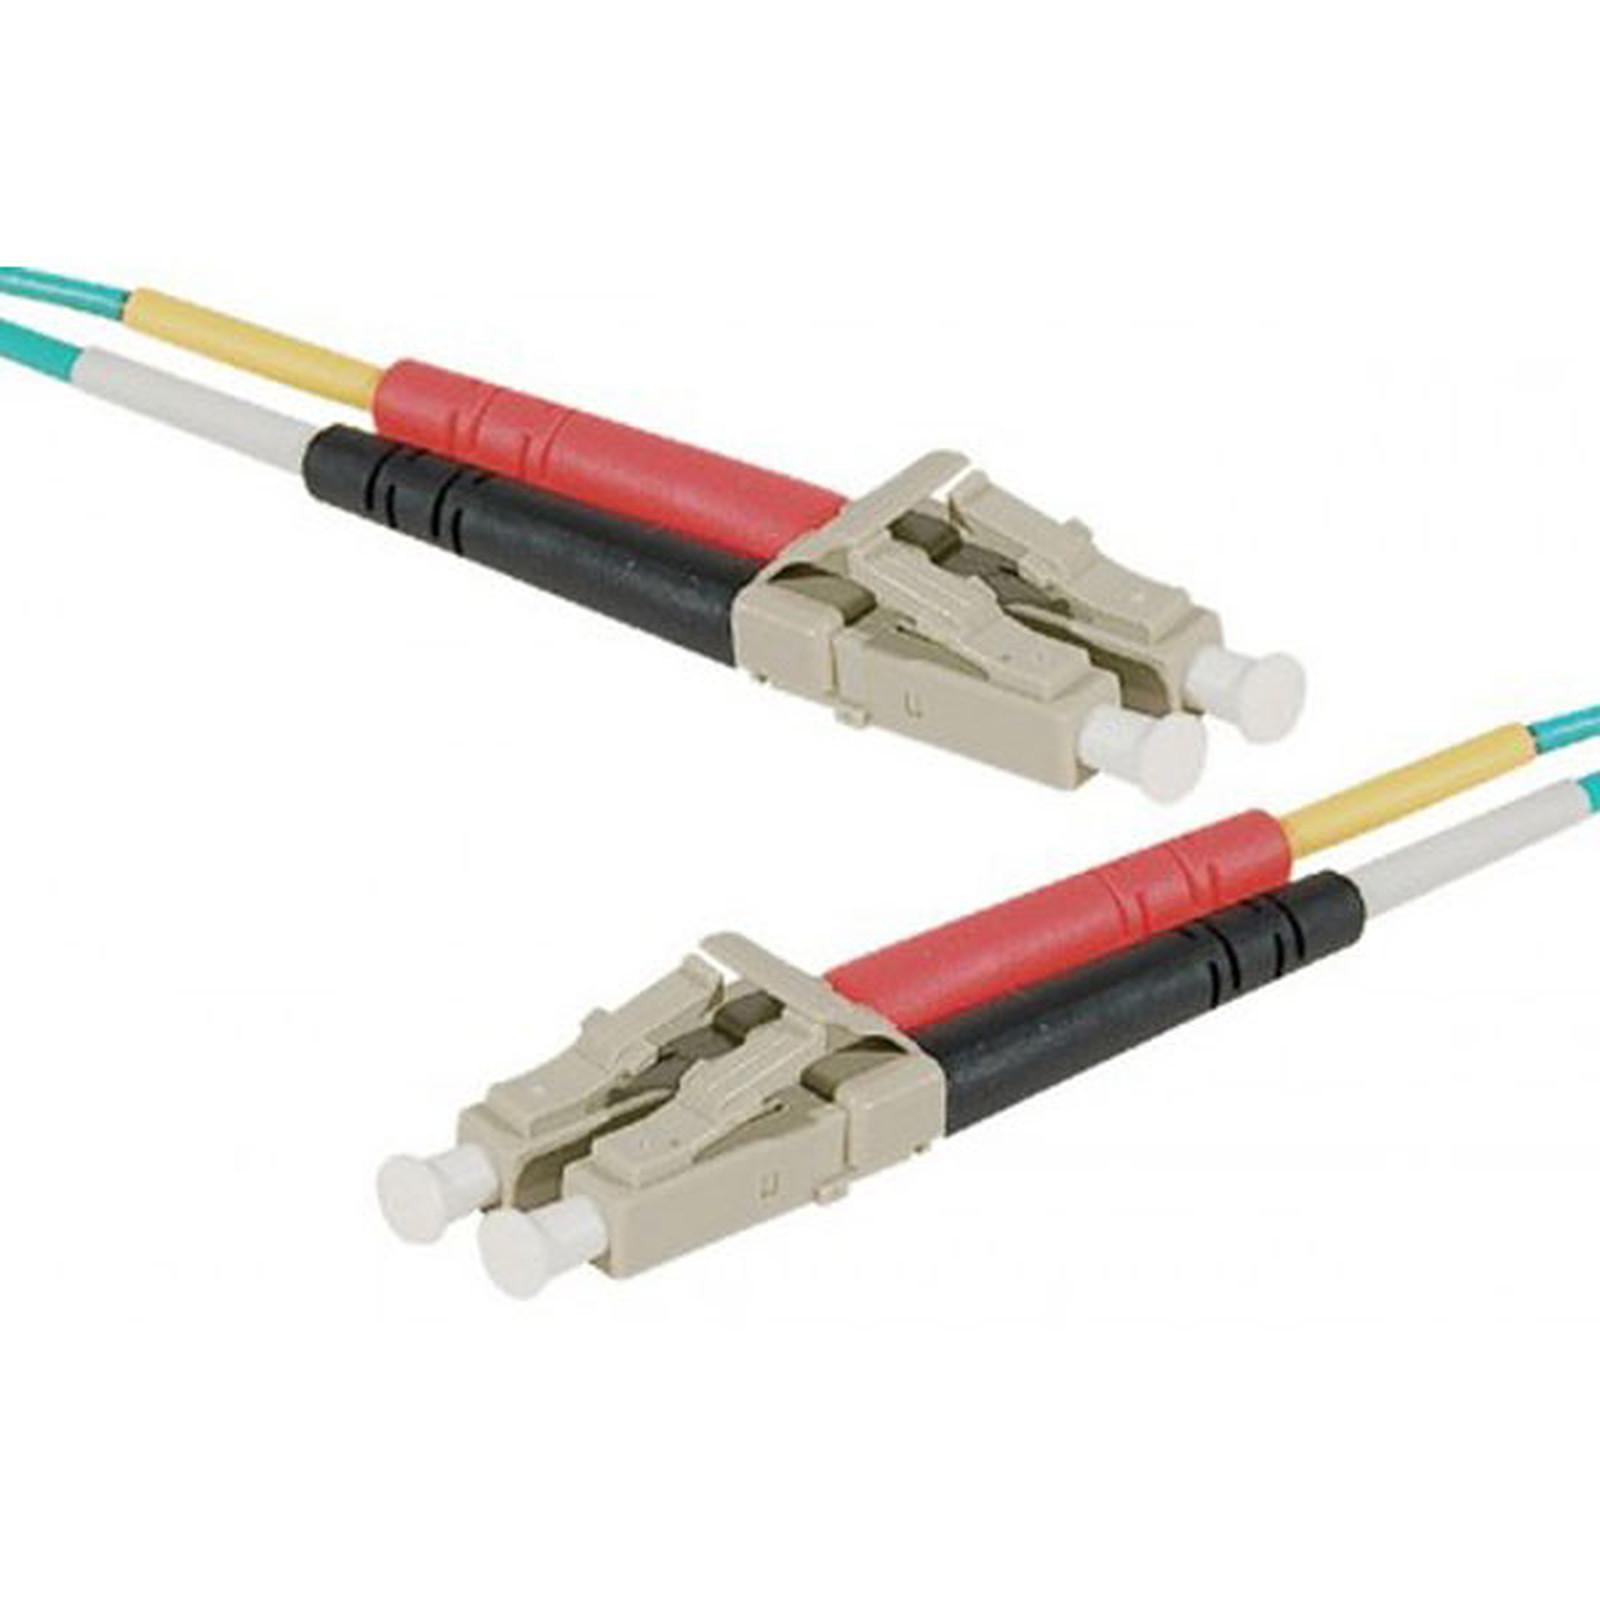 Cable de fibra óptica multimodo OM4 50/125 LC/LC (15 metros)